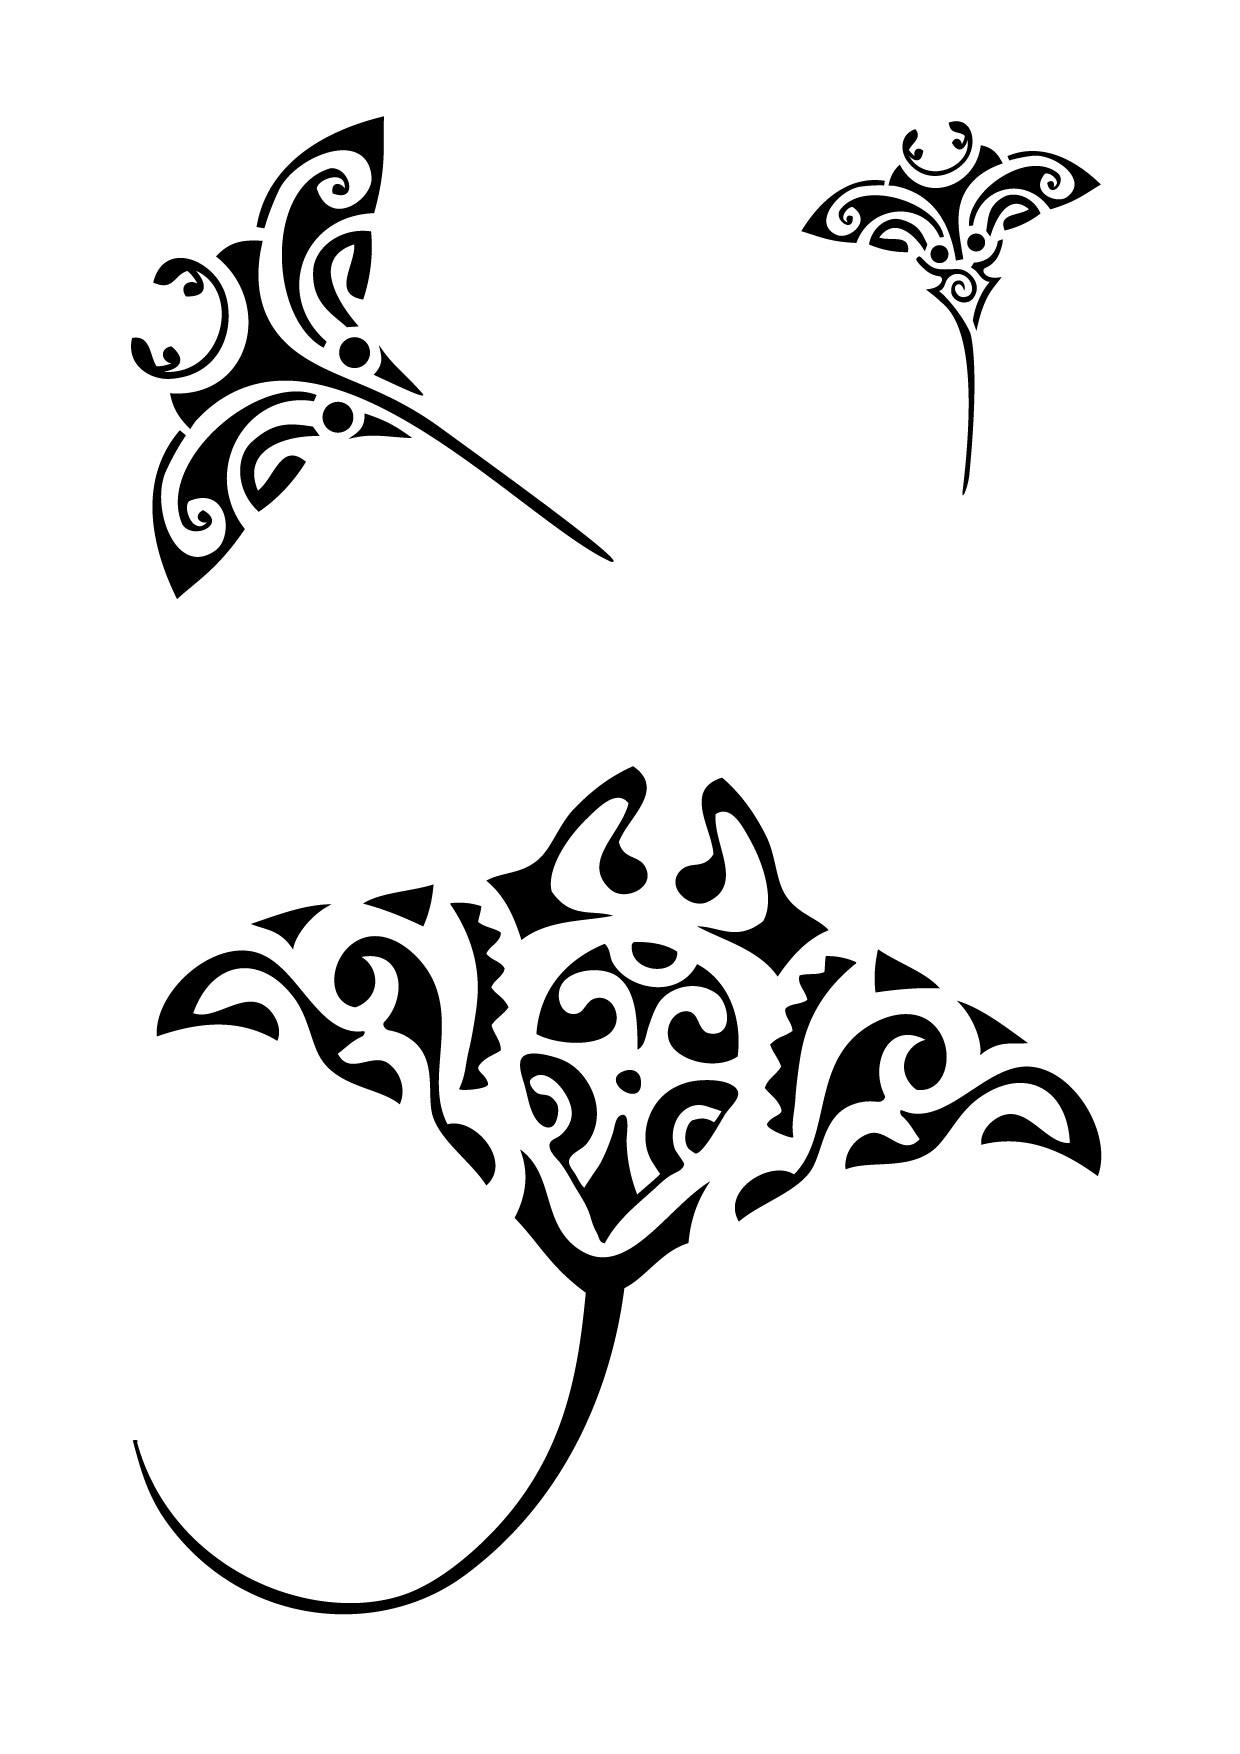 13 dessins de coloriage raie manta imprimer - Coloriage de requin a imprimer ...